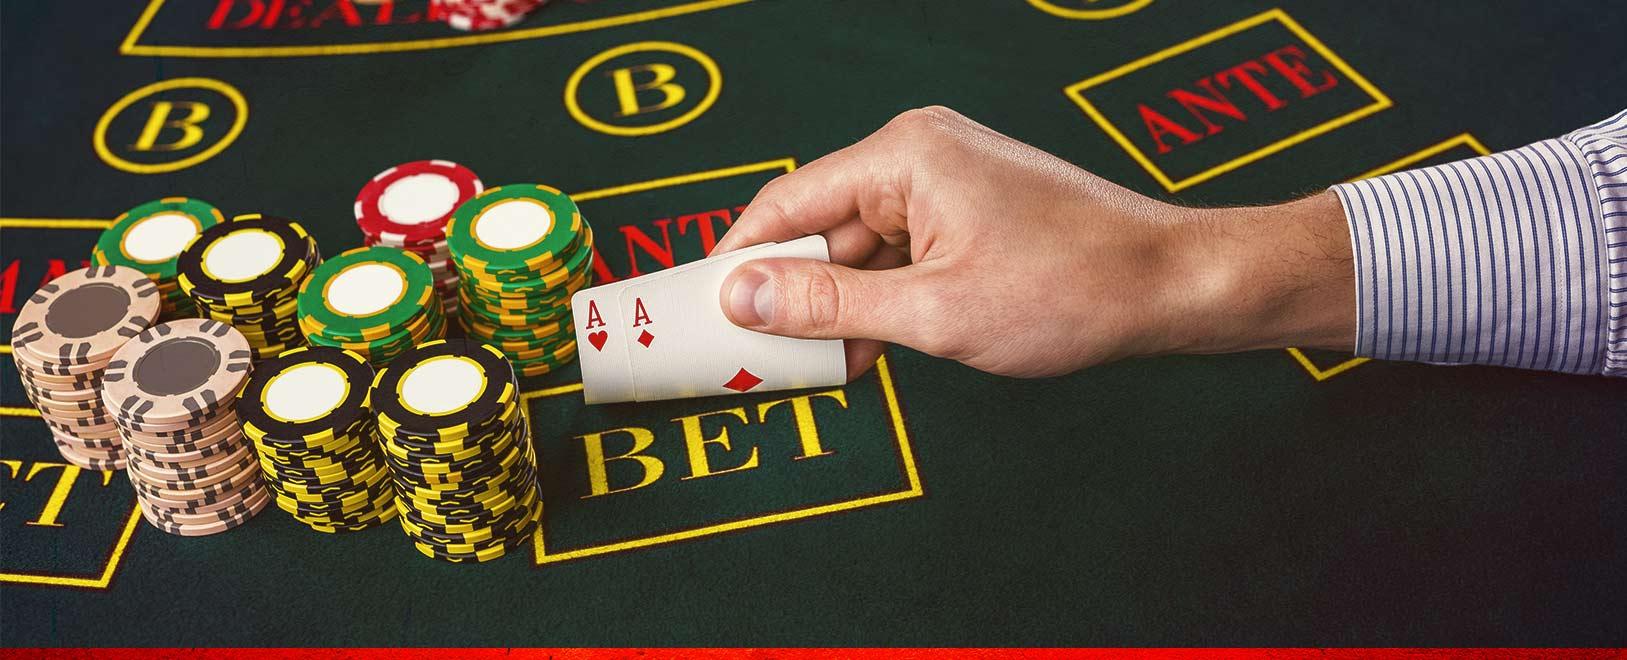 Expert Tips on How to Multi-table in Online Poker